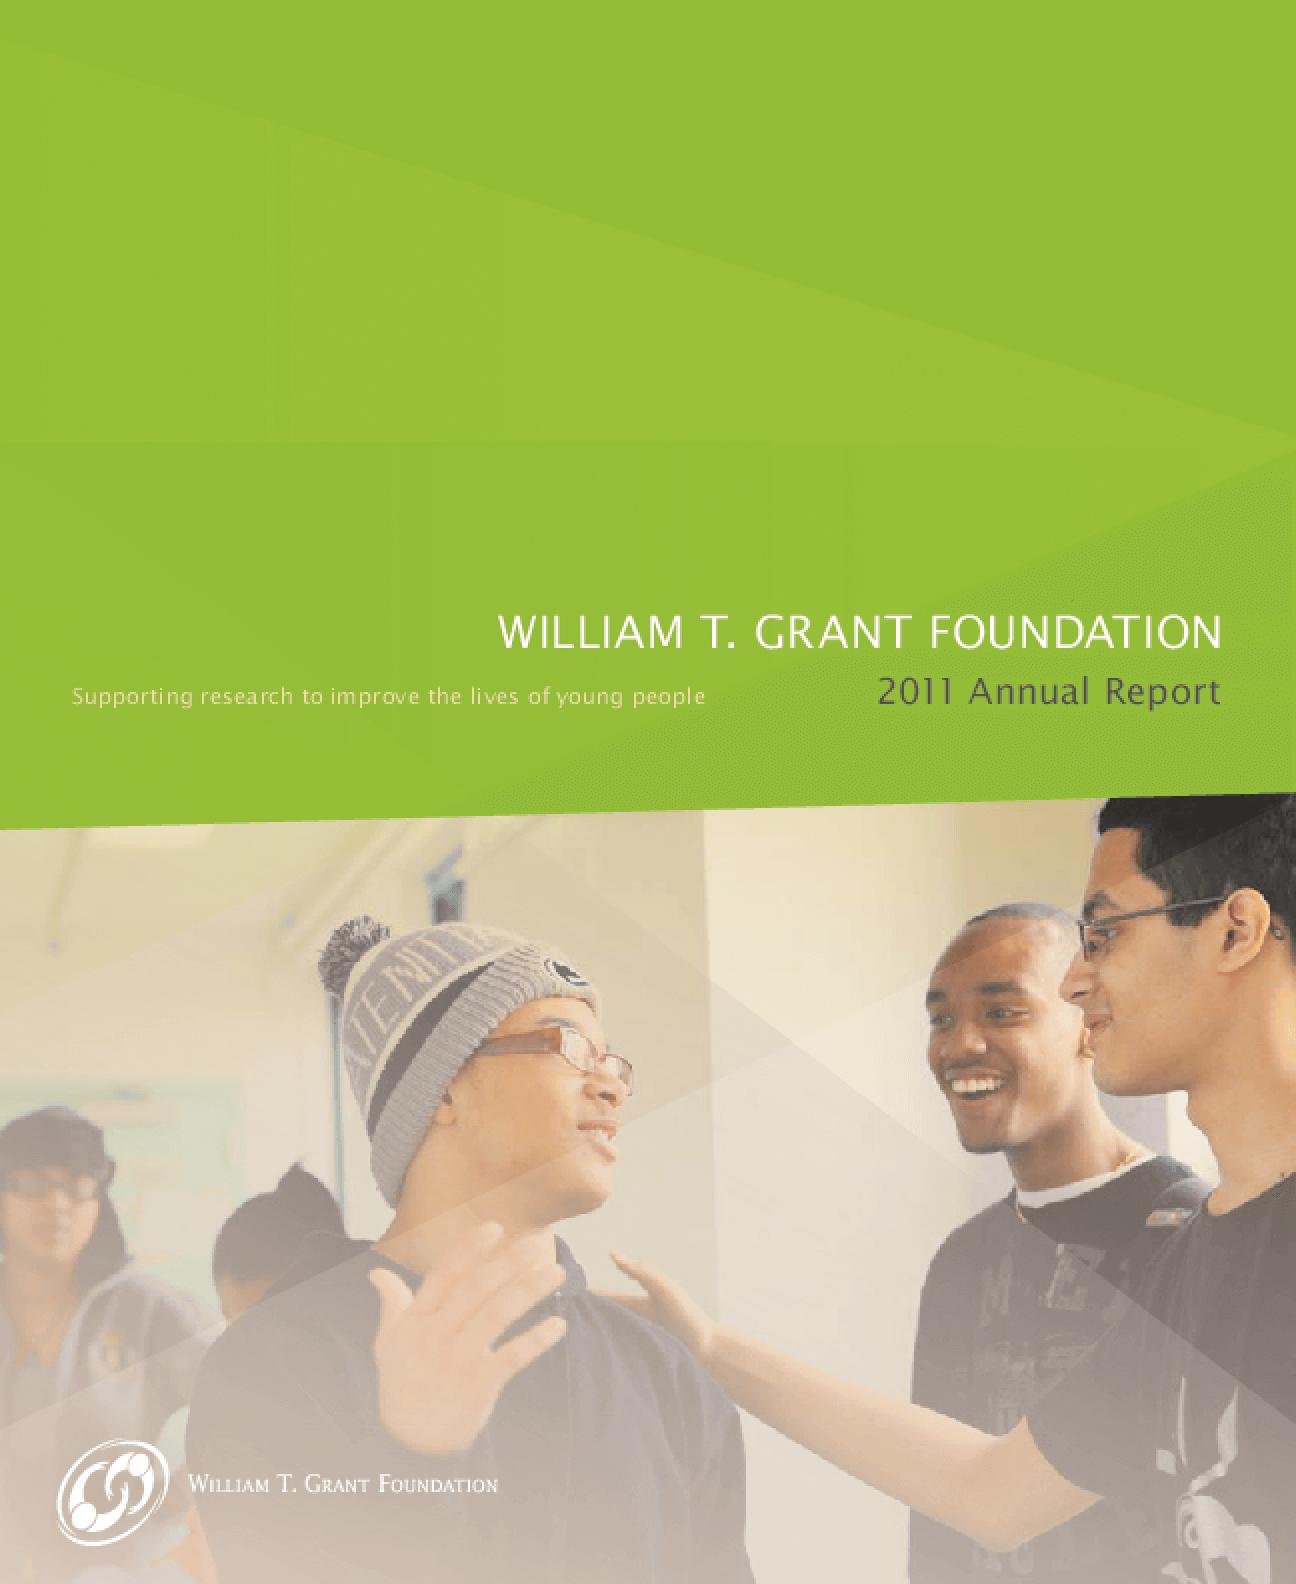 William T. Grant Foundation 2011 Annual Report